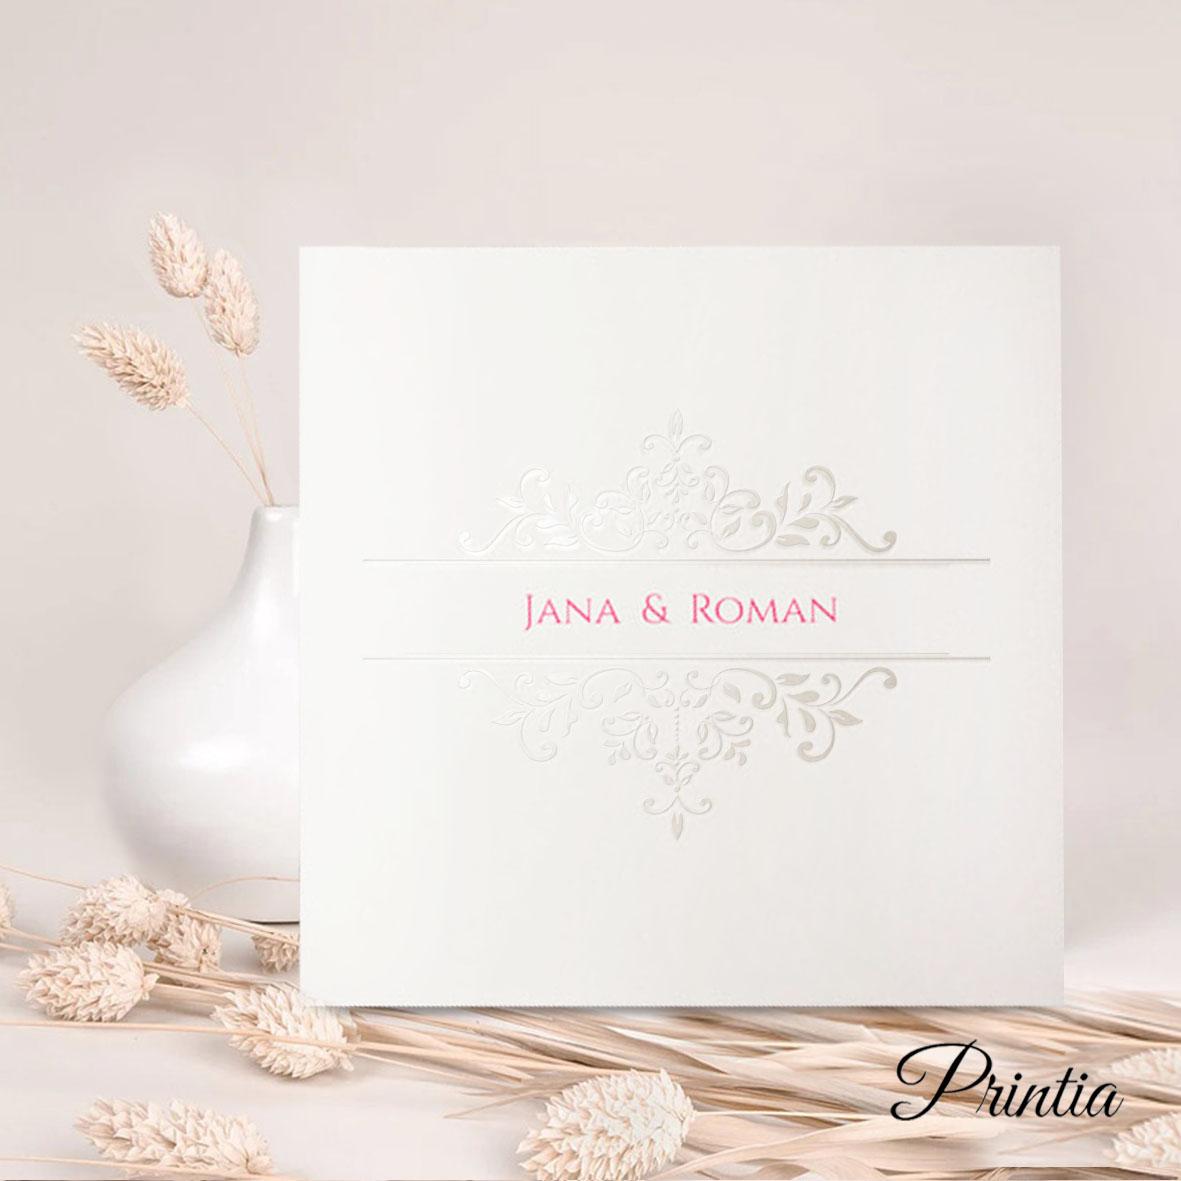 Elegant wedding invitation with shiny ornaments